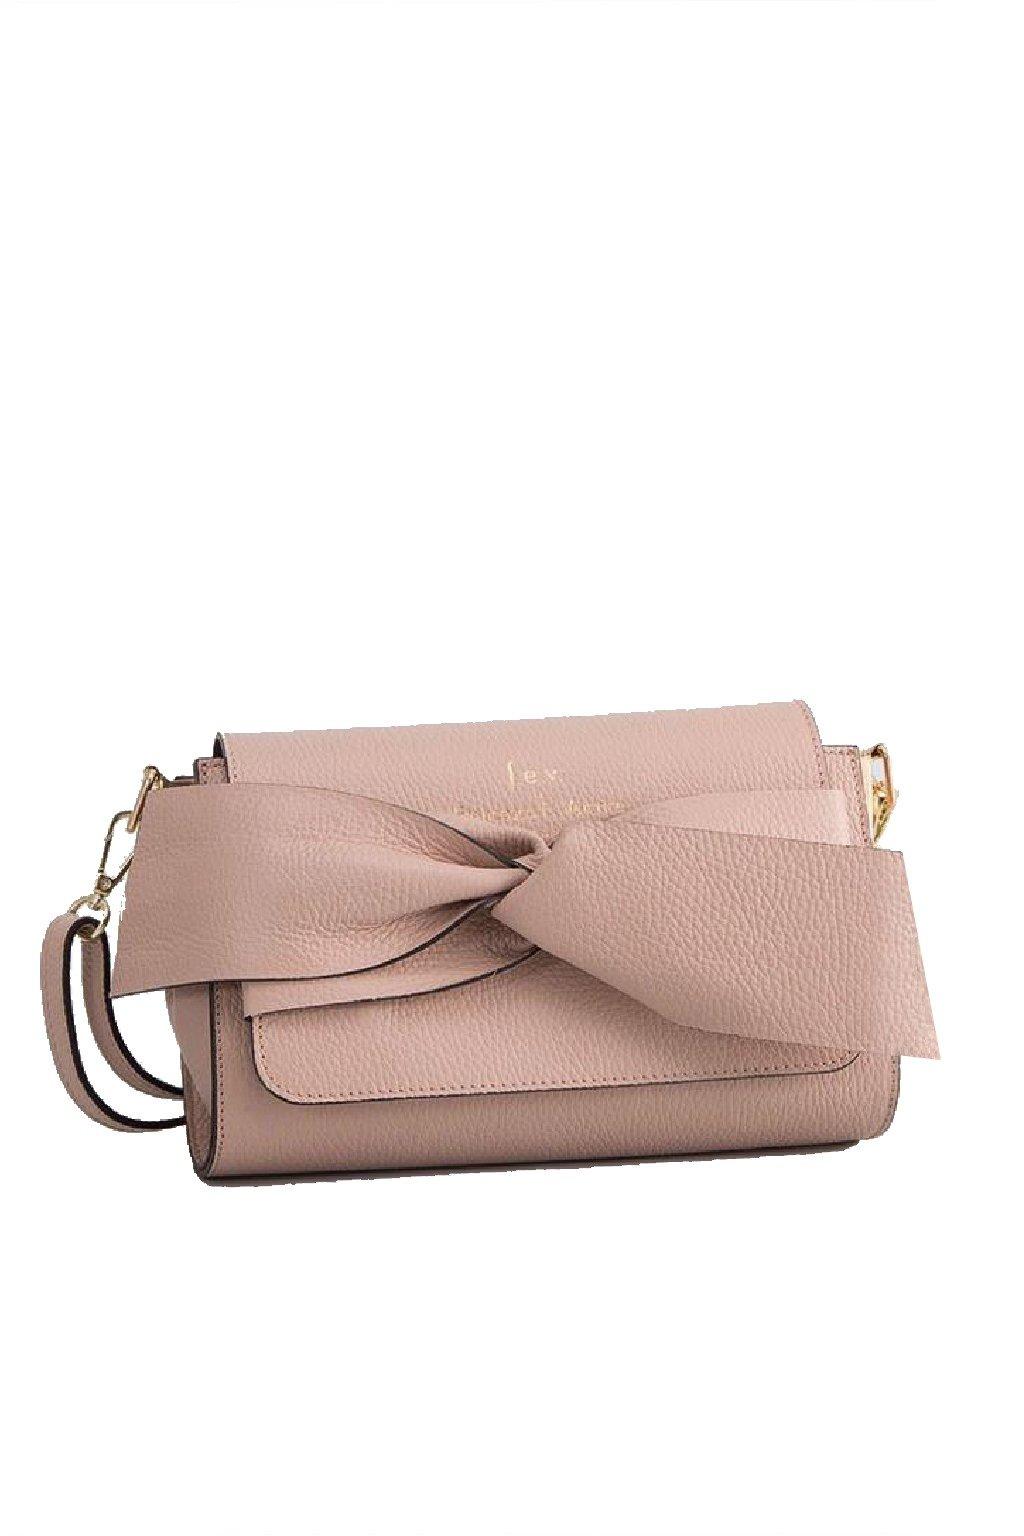 Crossbody kabelka přes rameno Versace ruzova (1)